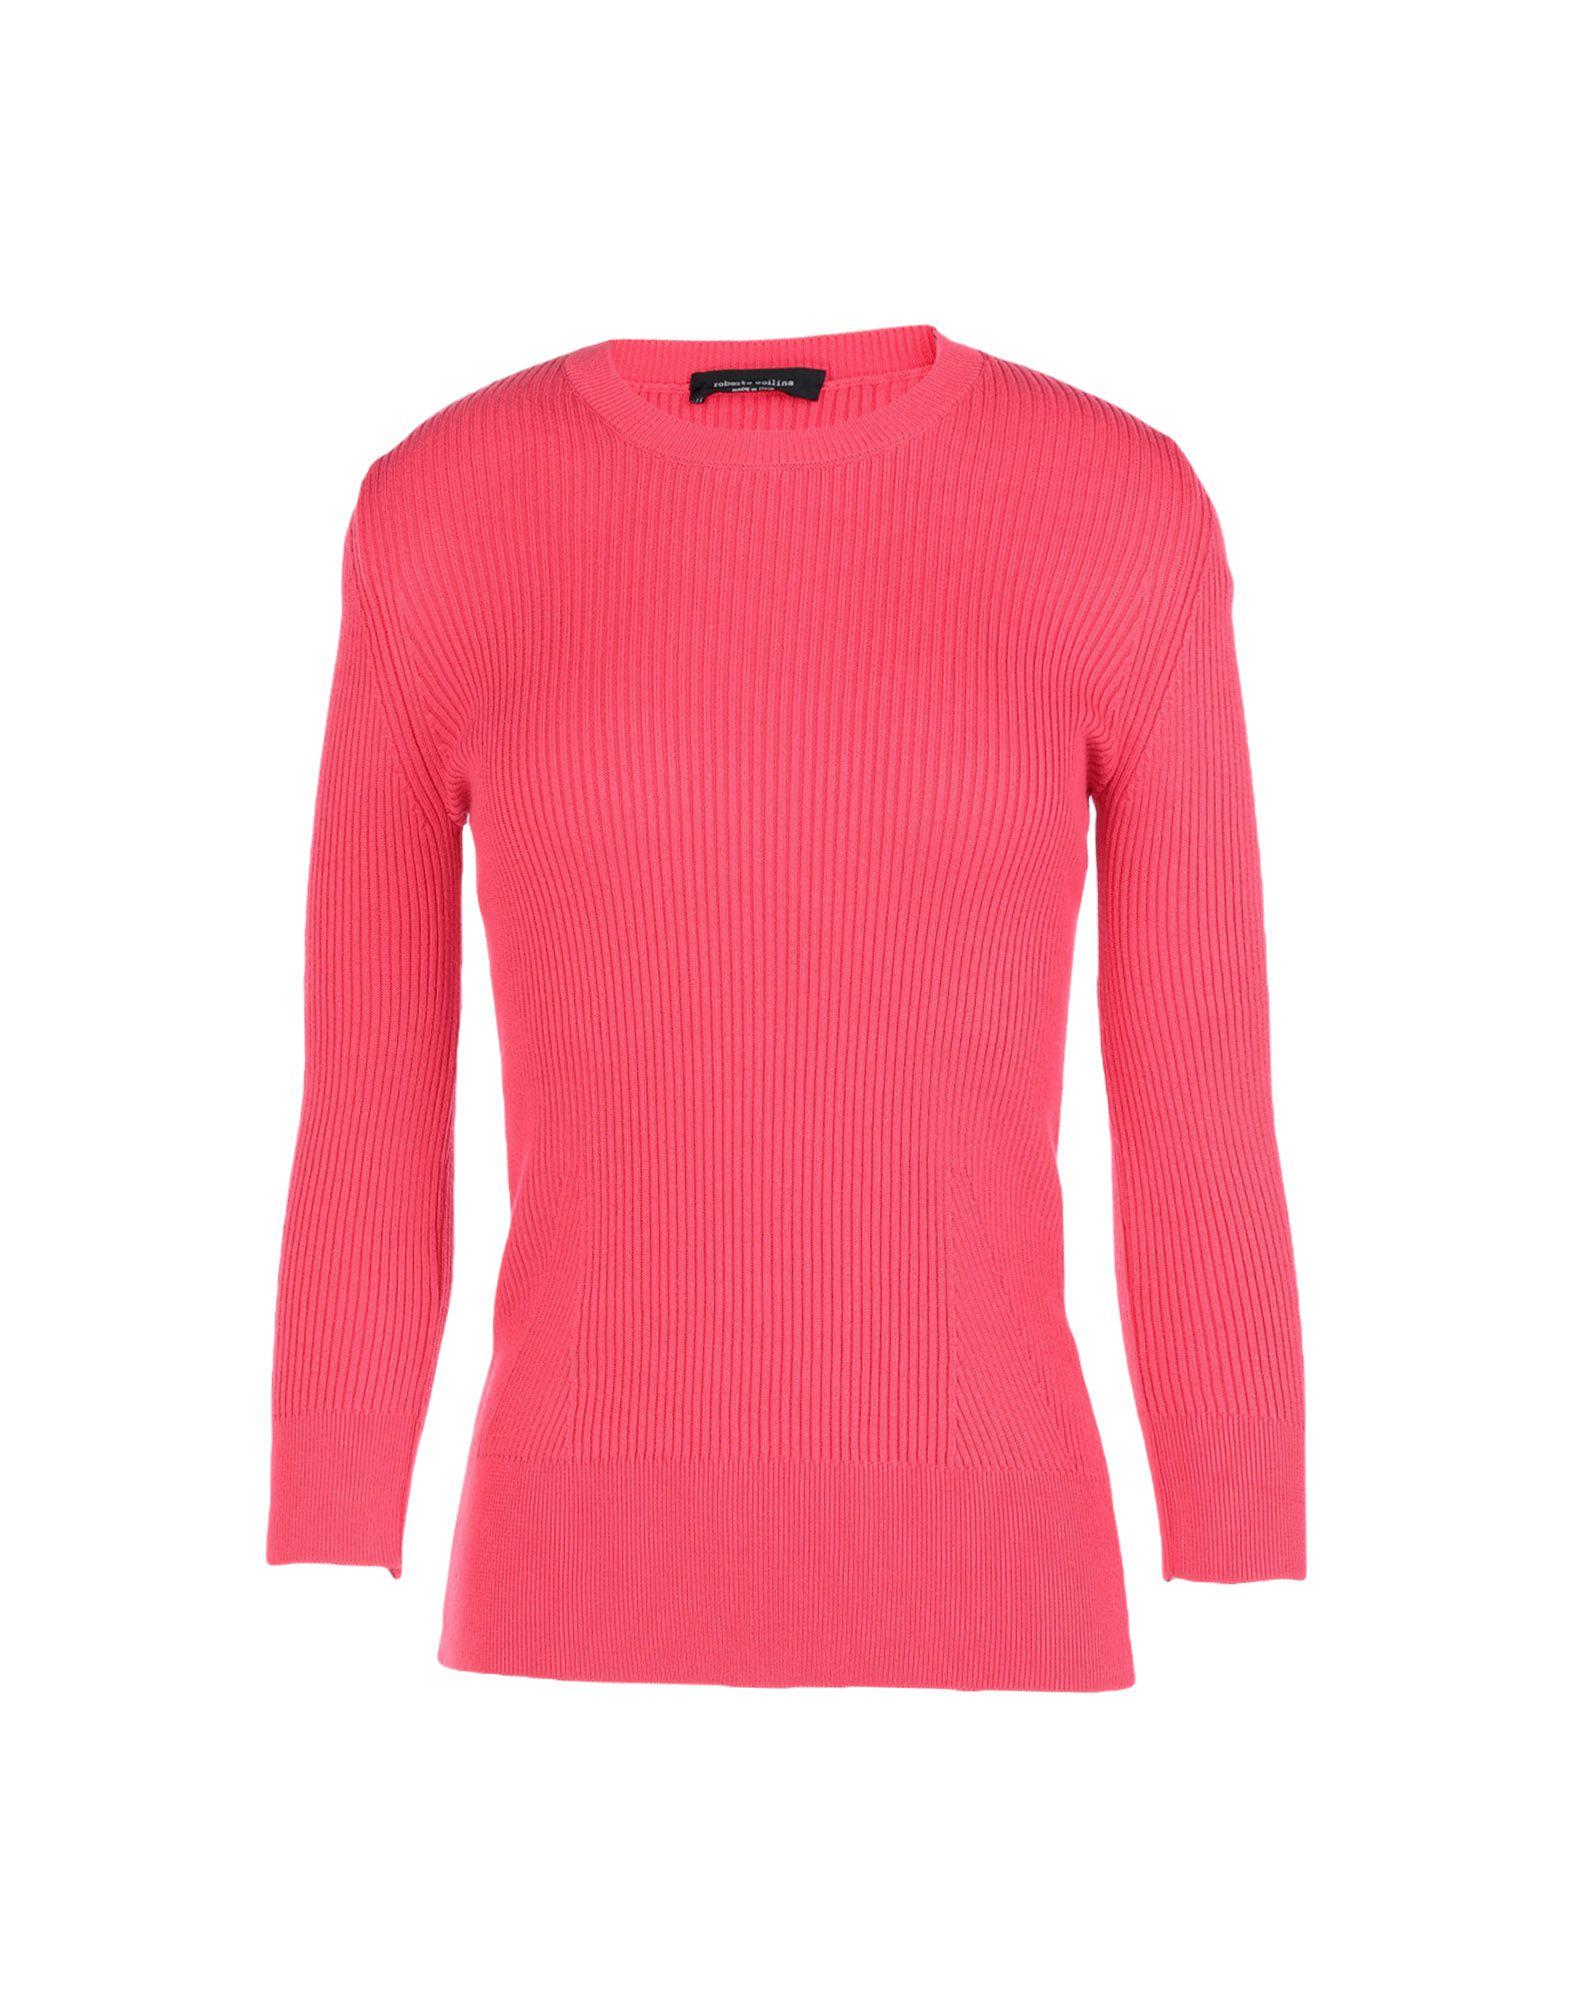 ROBERTO COLLINA | ROBERTO COLLINA Sweaters 39706803 | Goxip